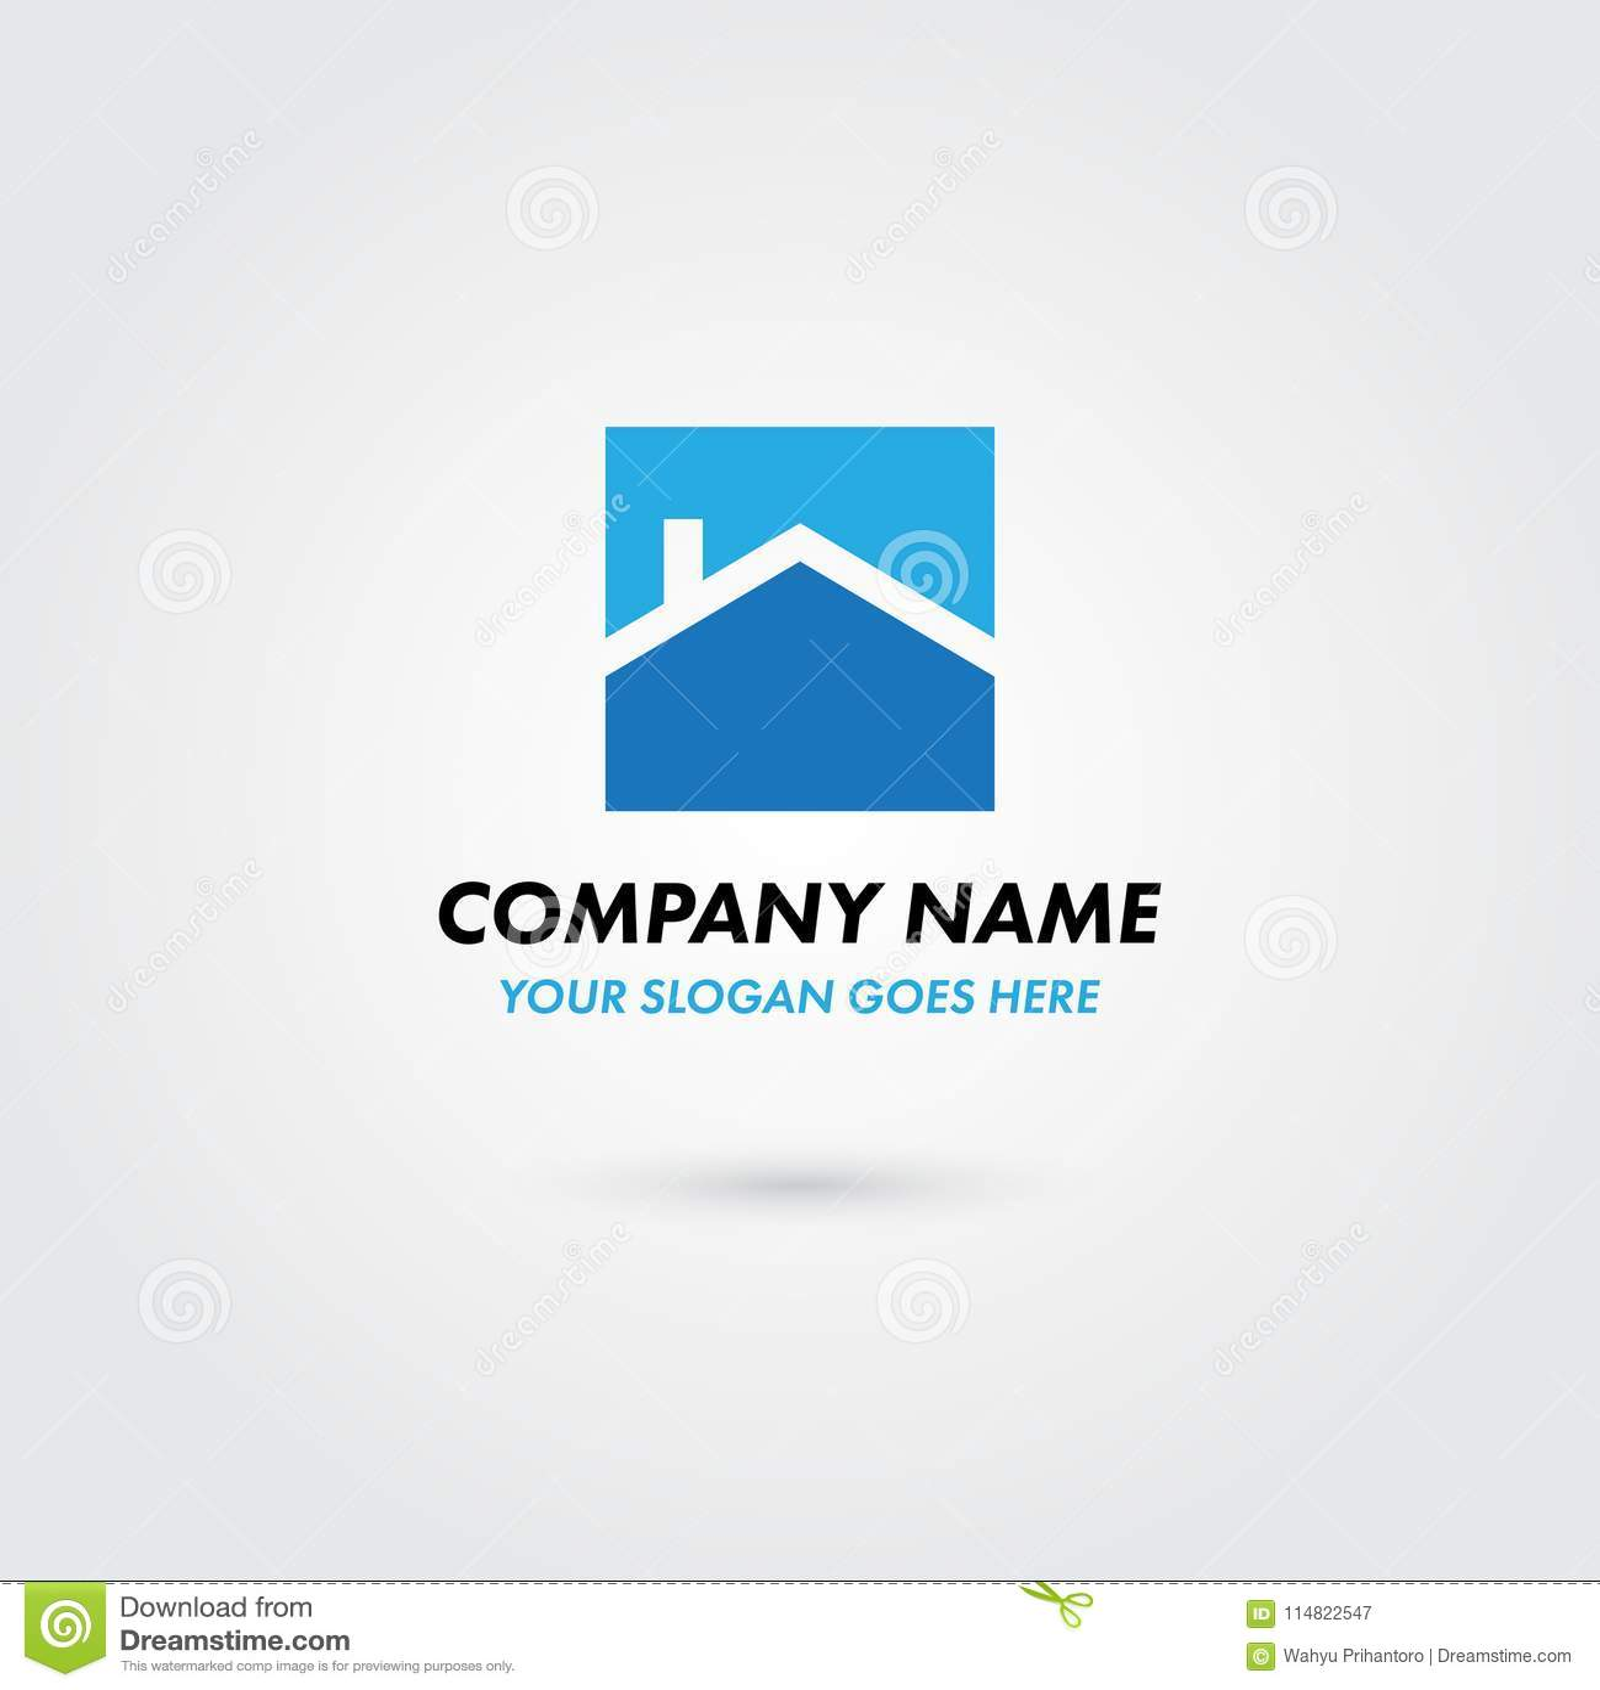 Real Estate Logo Concept Property House Developer Building Home